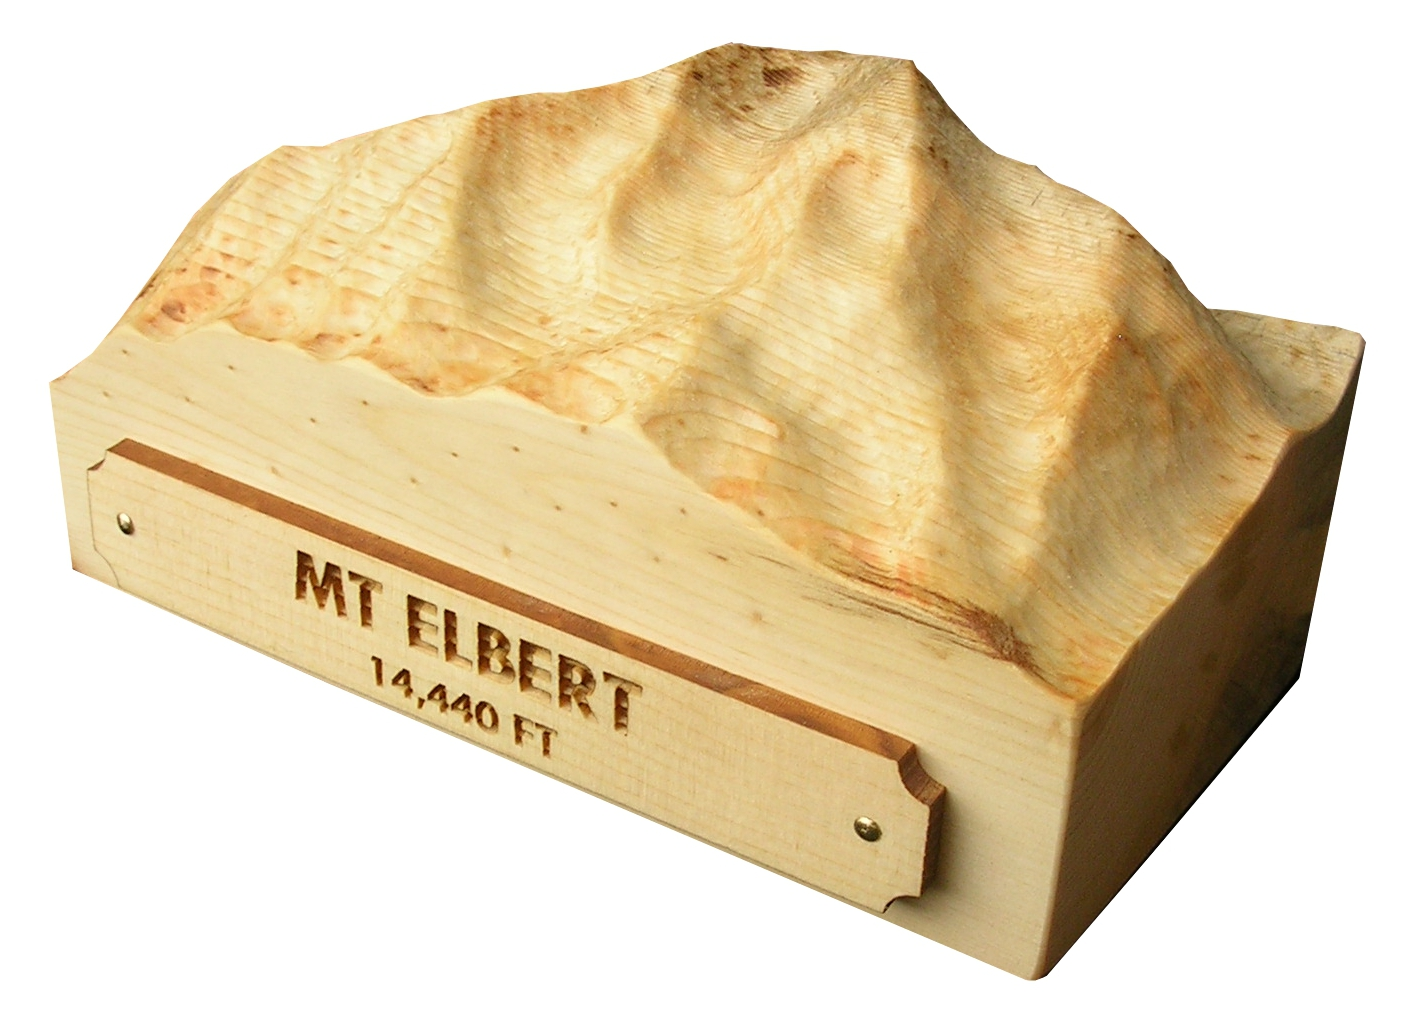 Mount-Elbert-Carving-Gift.jpg